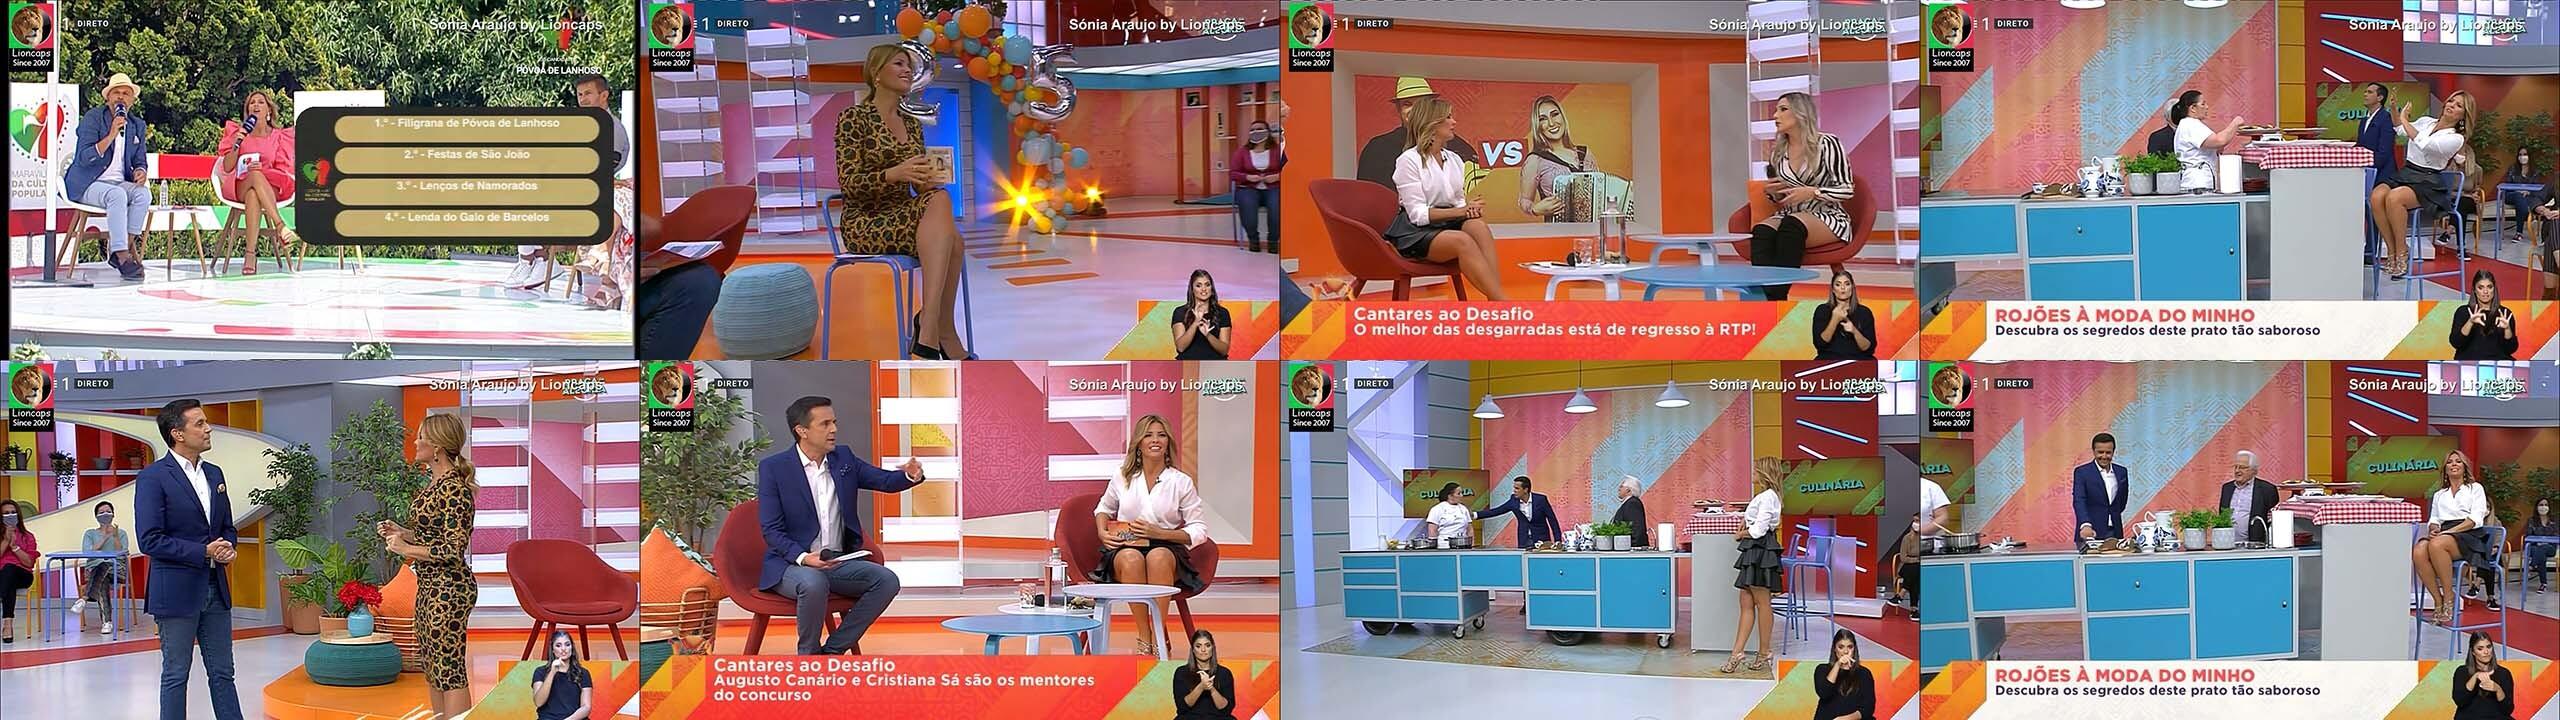 sonia_araujo_praca_lioncaps_21_11_2020_h265.jpg